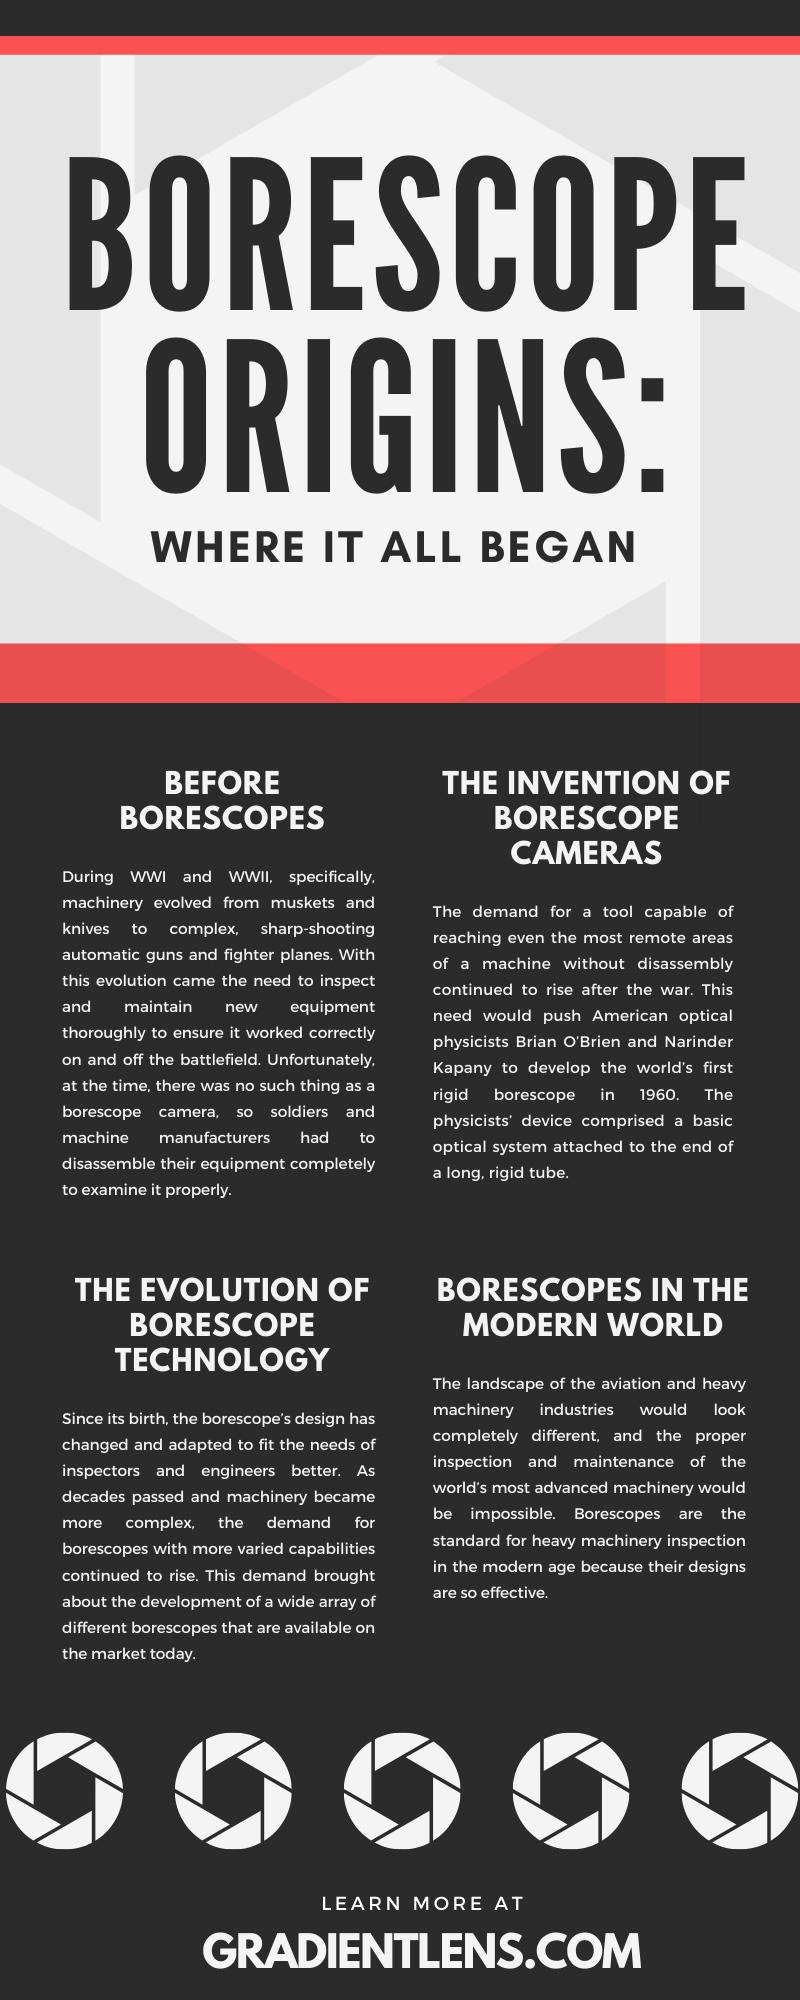 Borescope Origins: Where It All Began